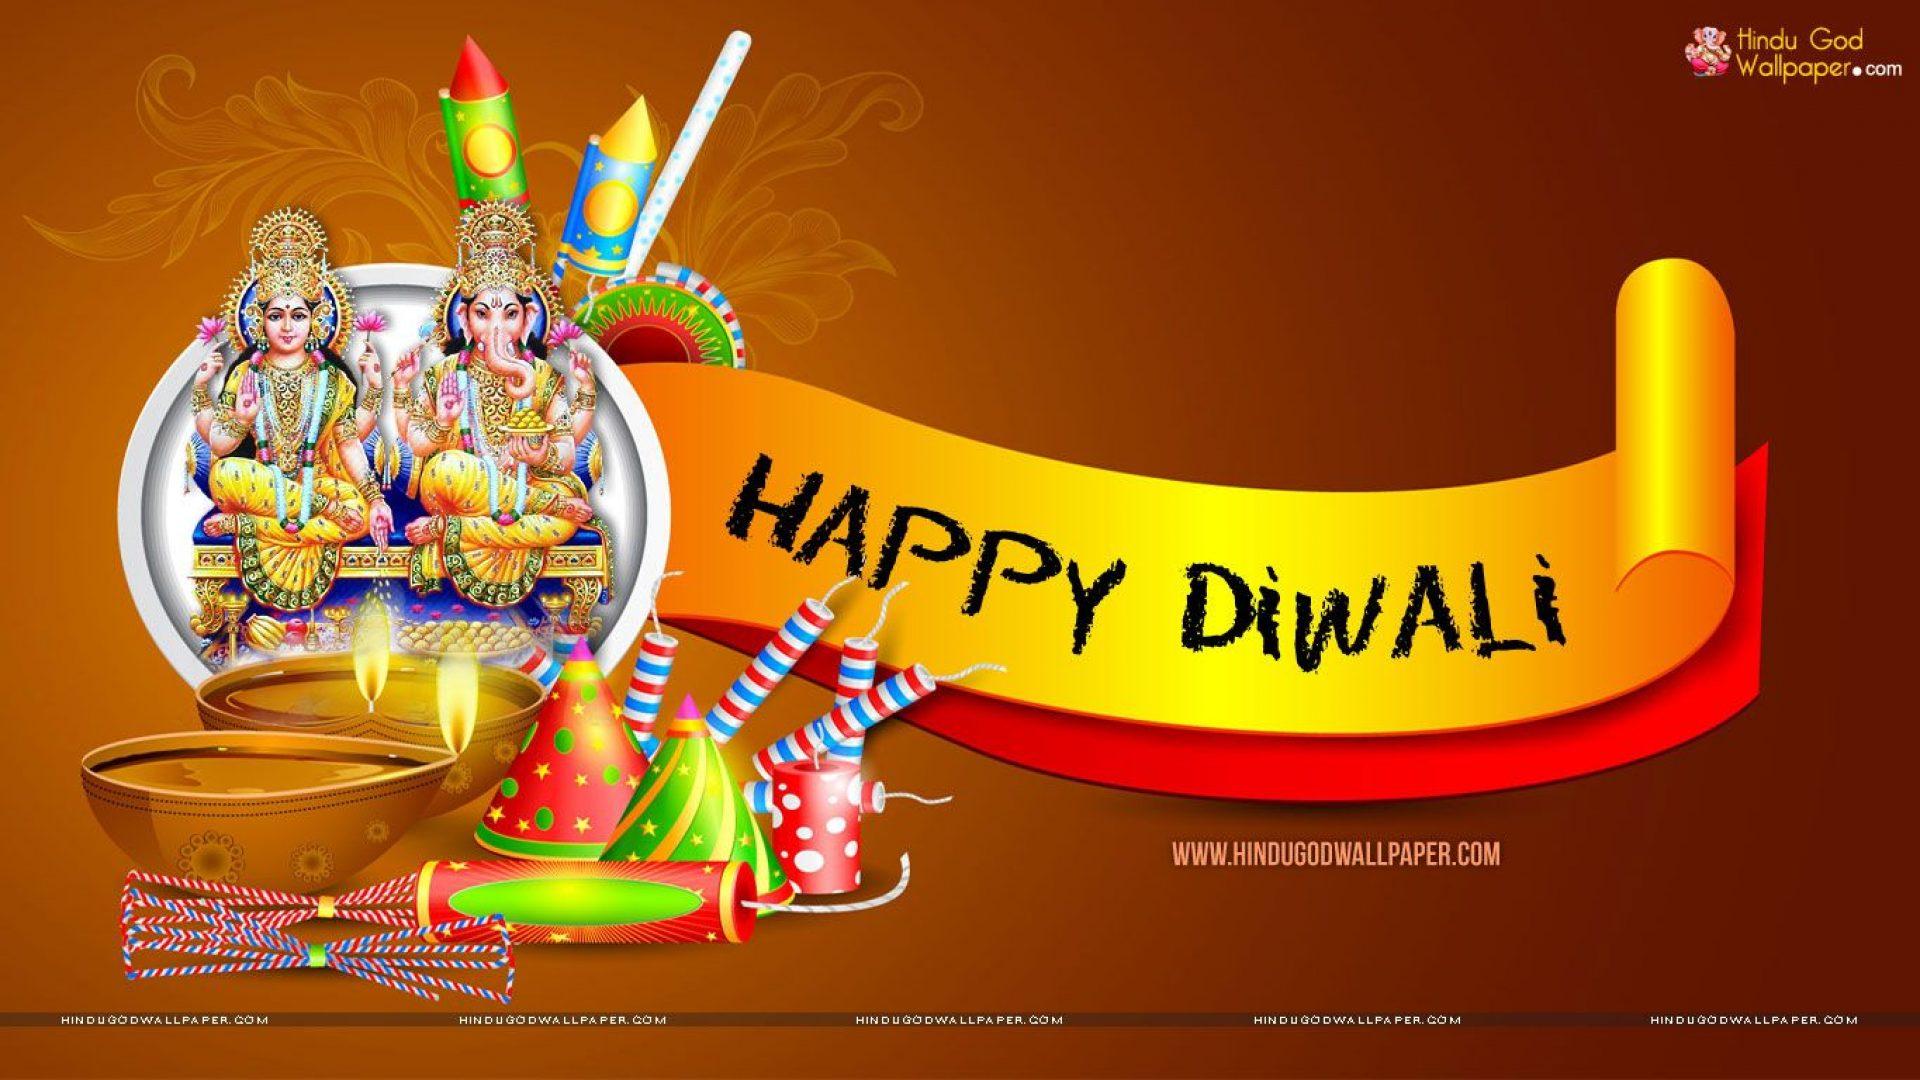 laxmi ganesh happy diwali wallpaper festivals laxmi ganesh happy diwali wallpaper